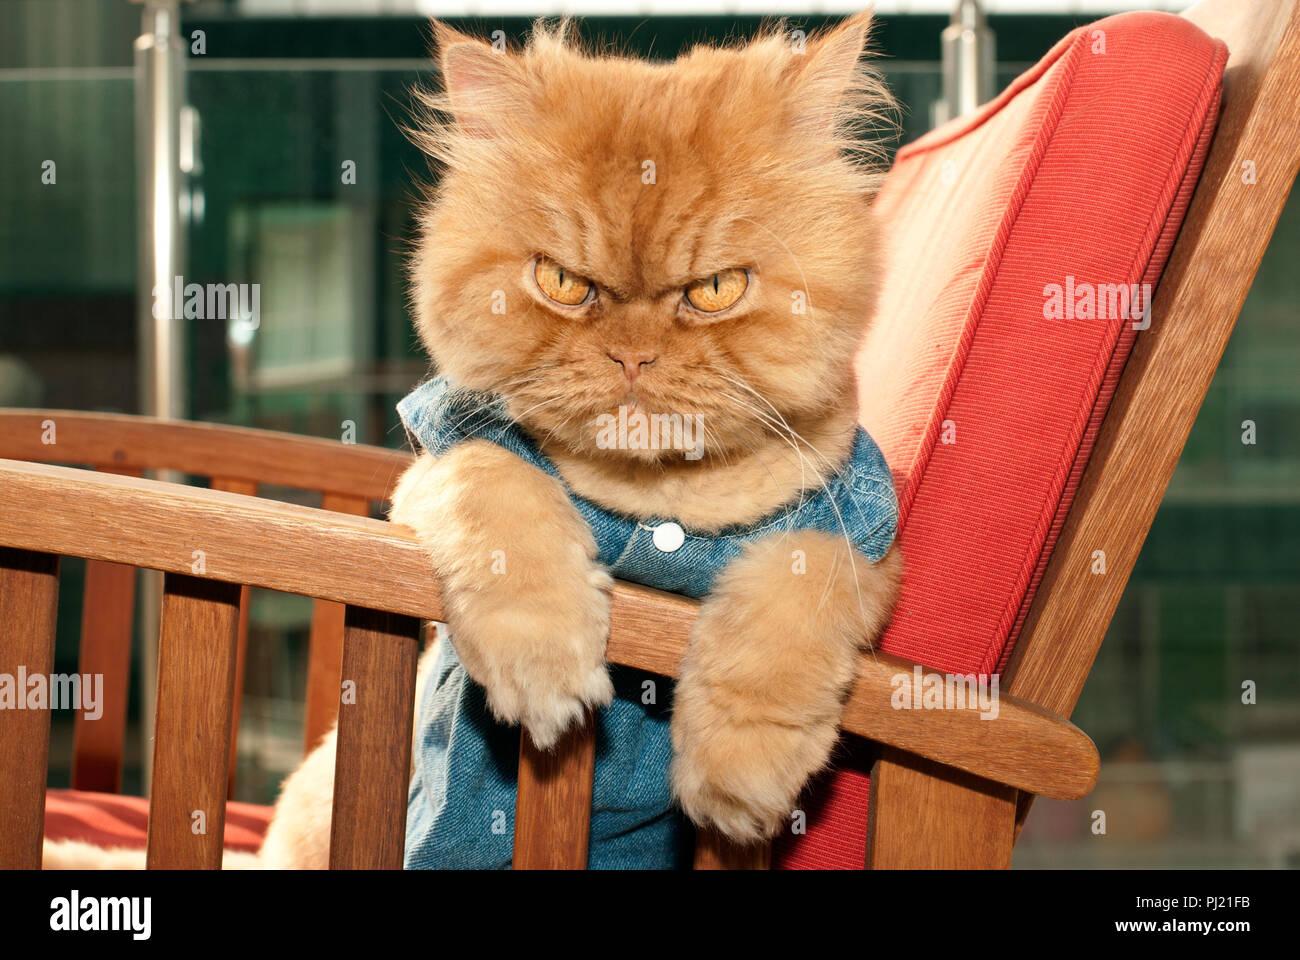 Rojo persa tradicional gato sentado en la silla Imagen De Stock